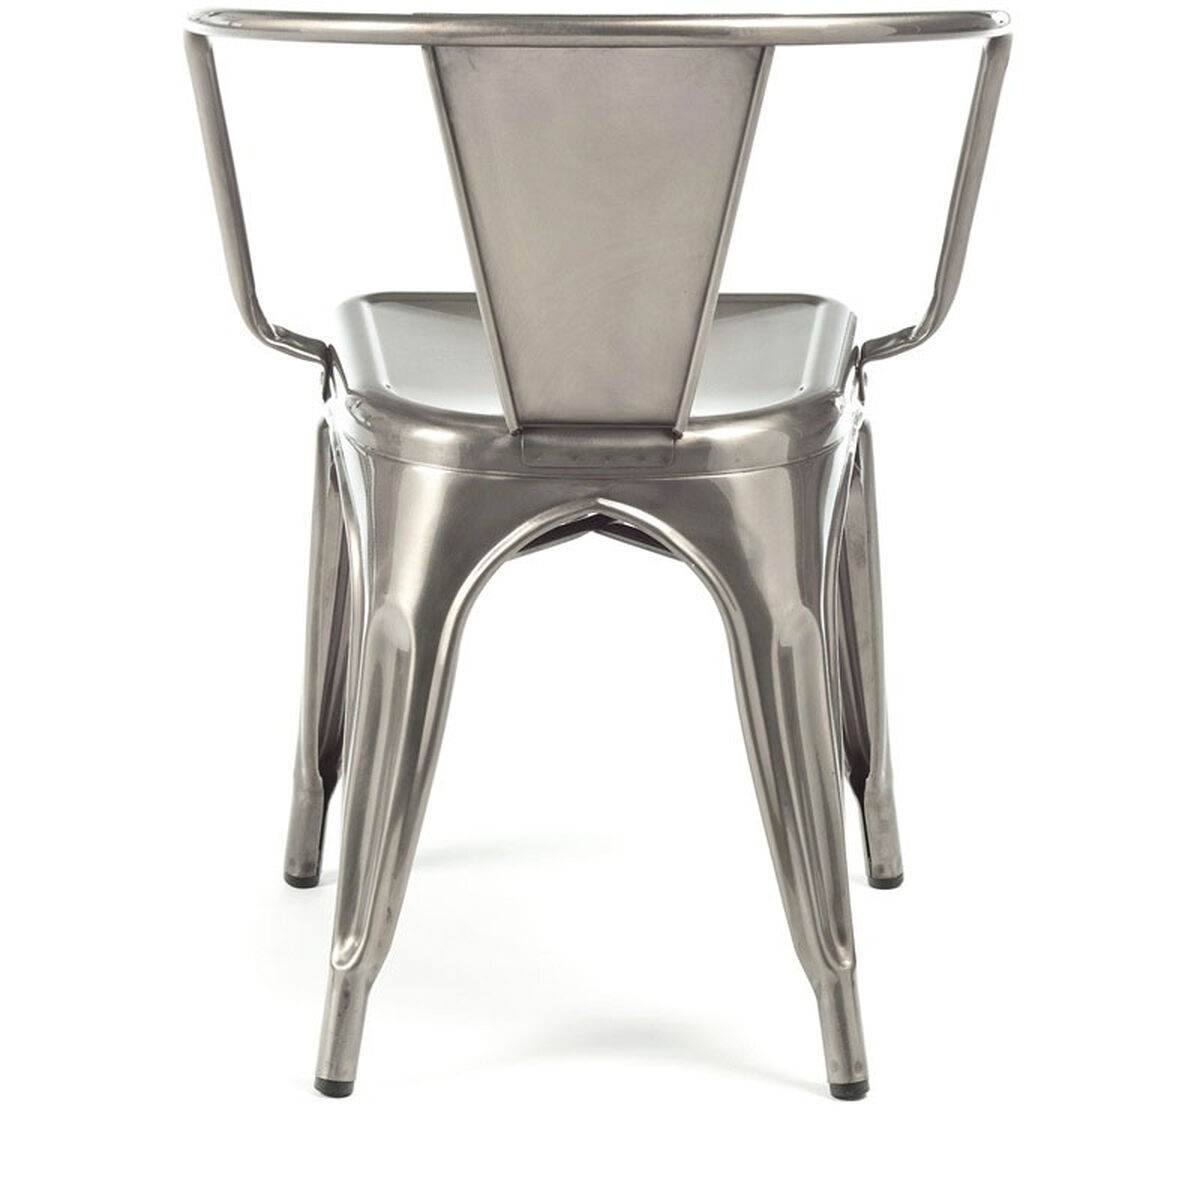 Design Lab Mn Dreux Clear Gunmetal Stackable Steel Dining